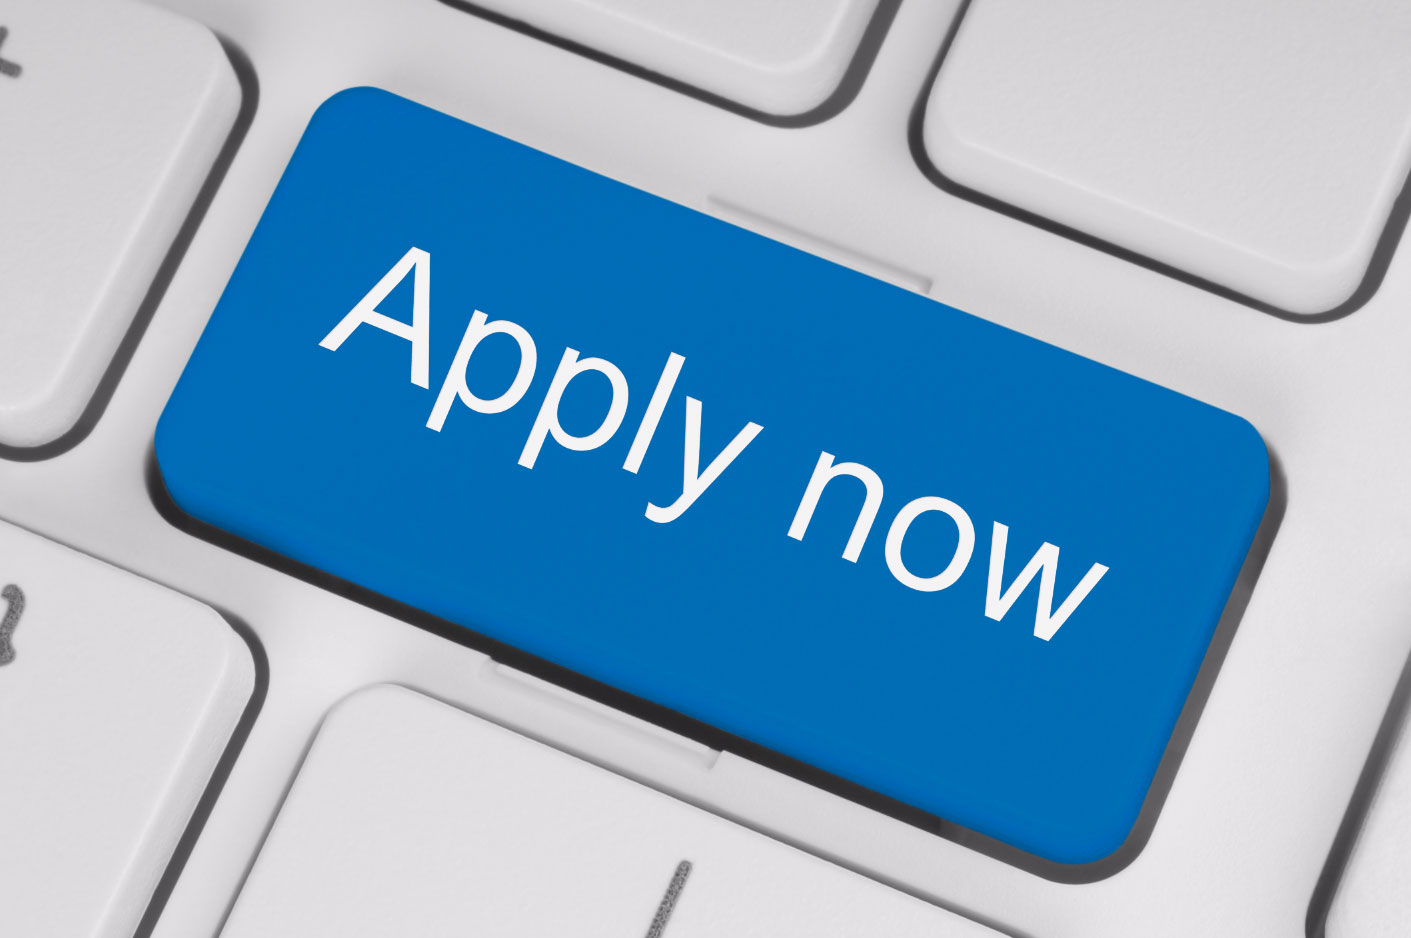 choosing an Apprenticeship